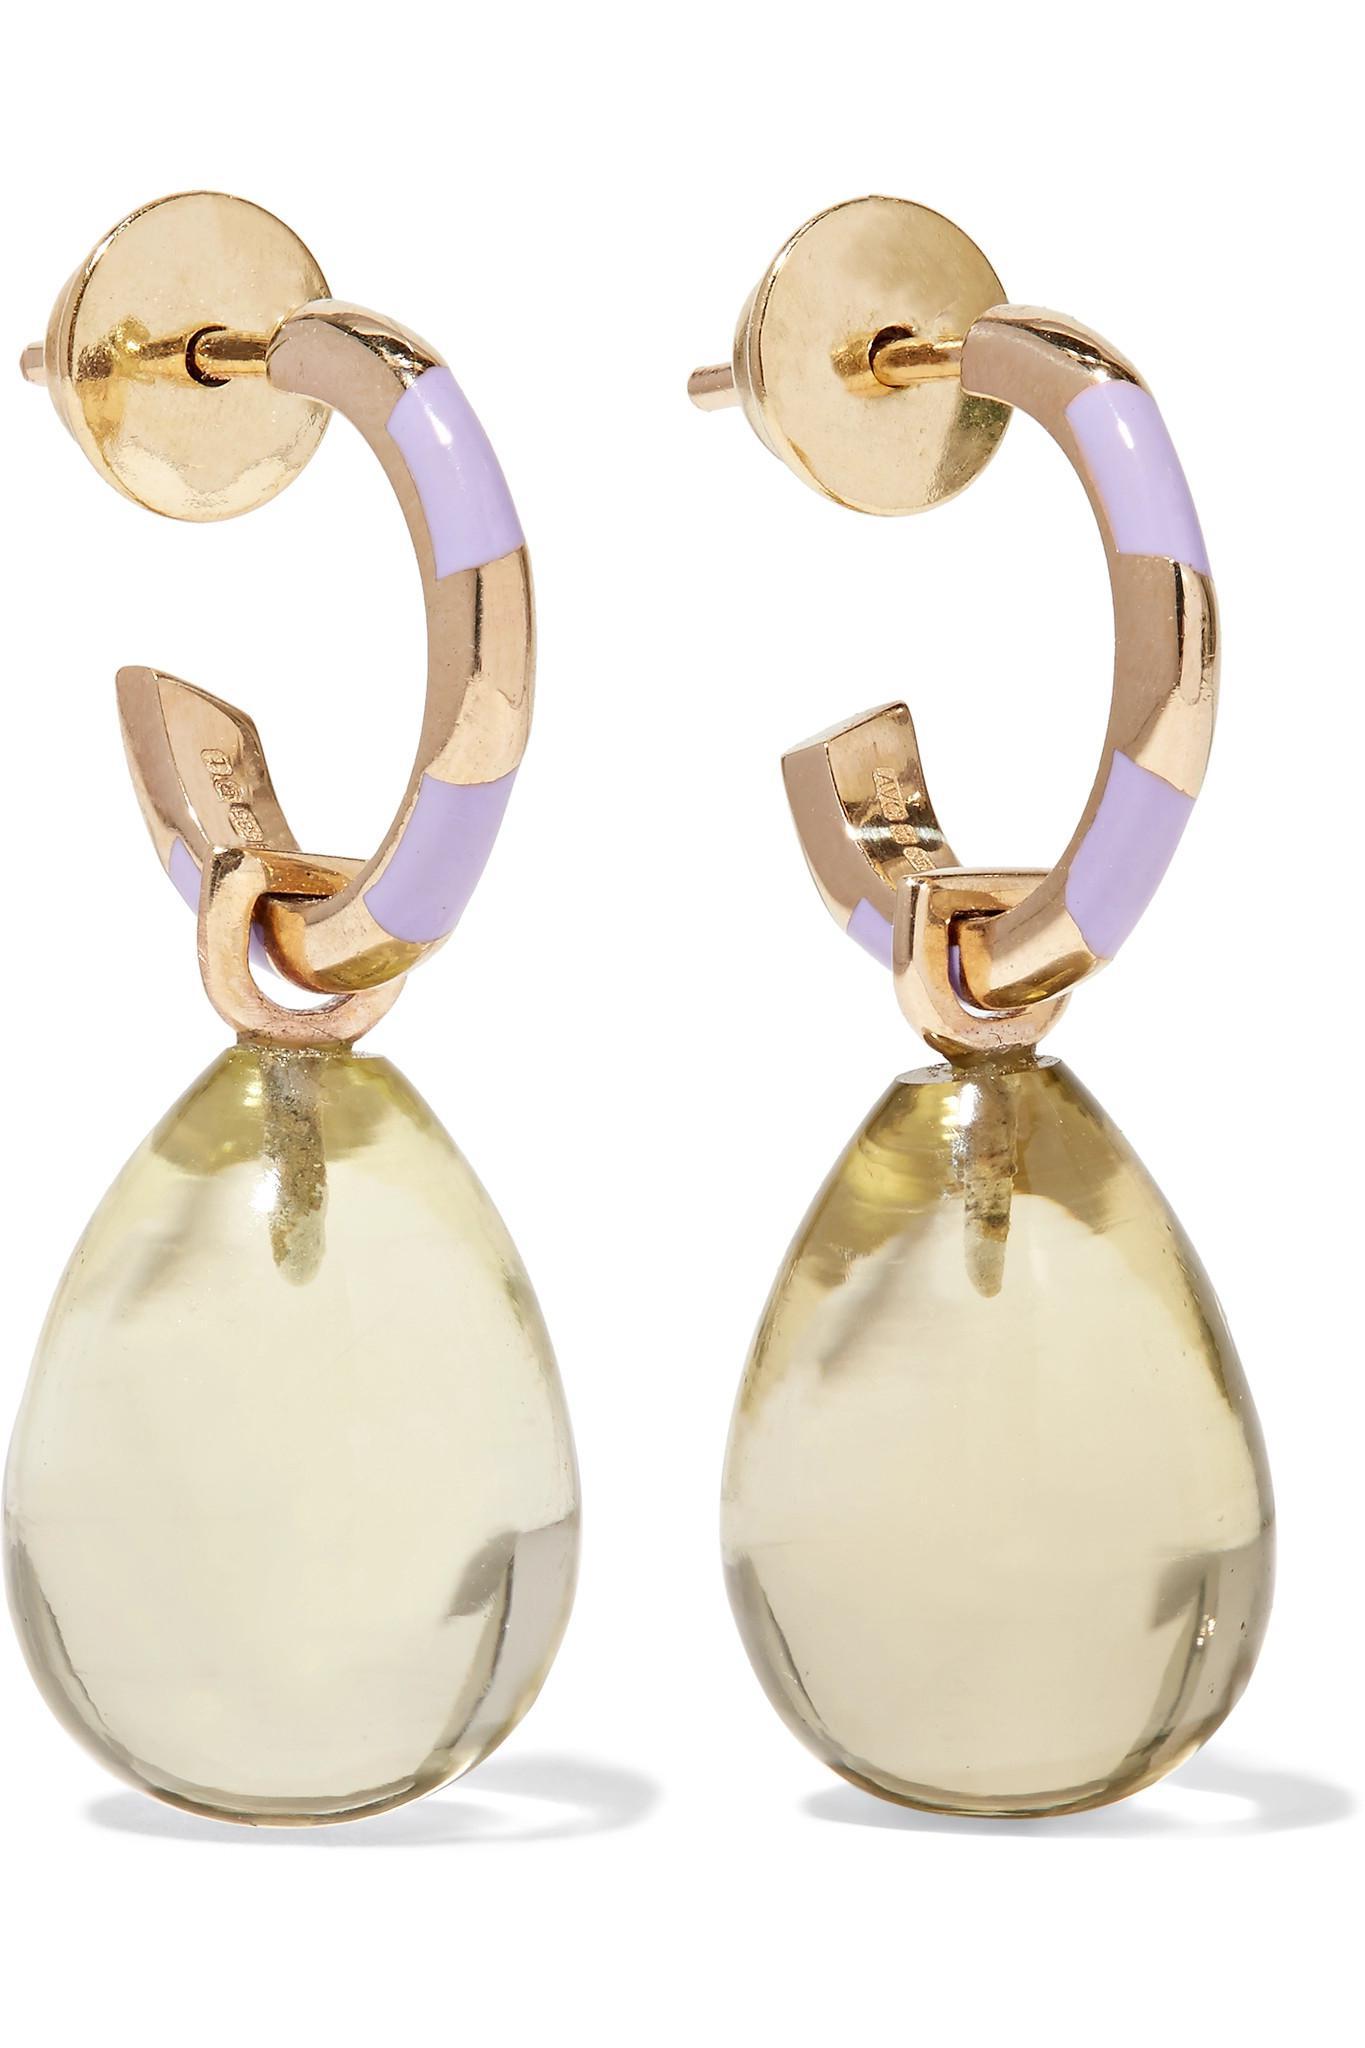 Alice Cicolini 14-karat Gold, Quartz And Enamel Earrings